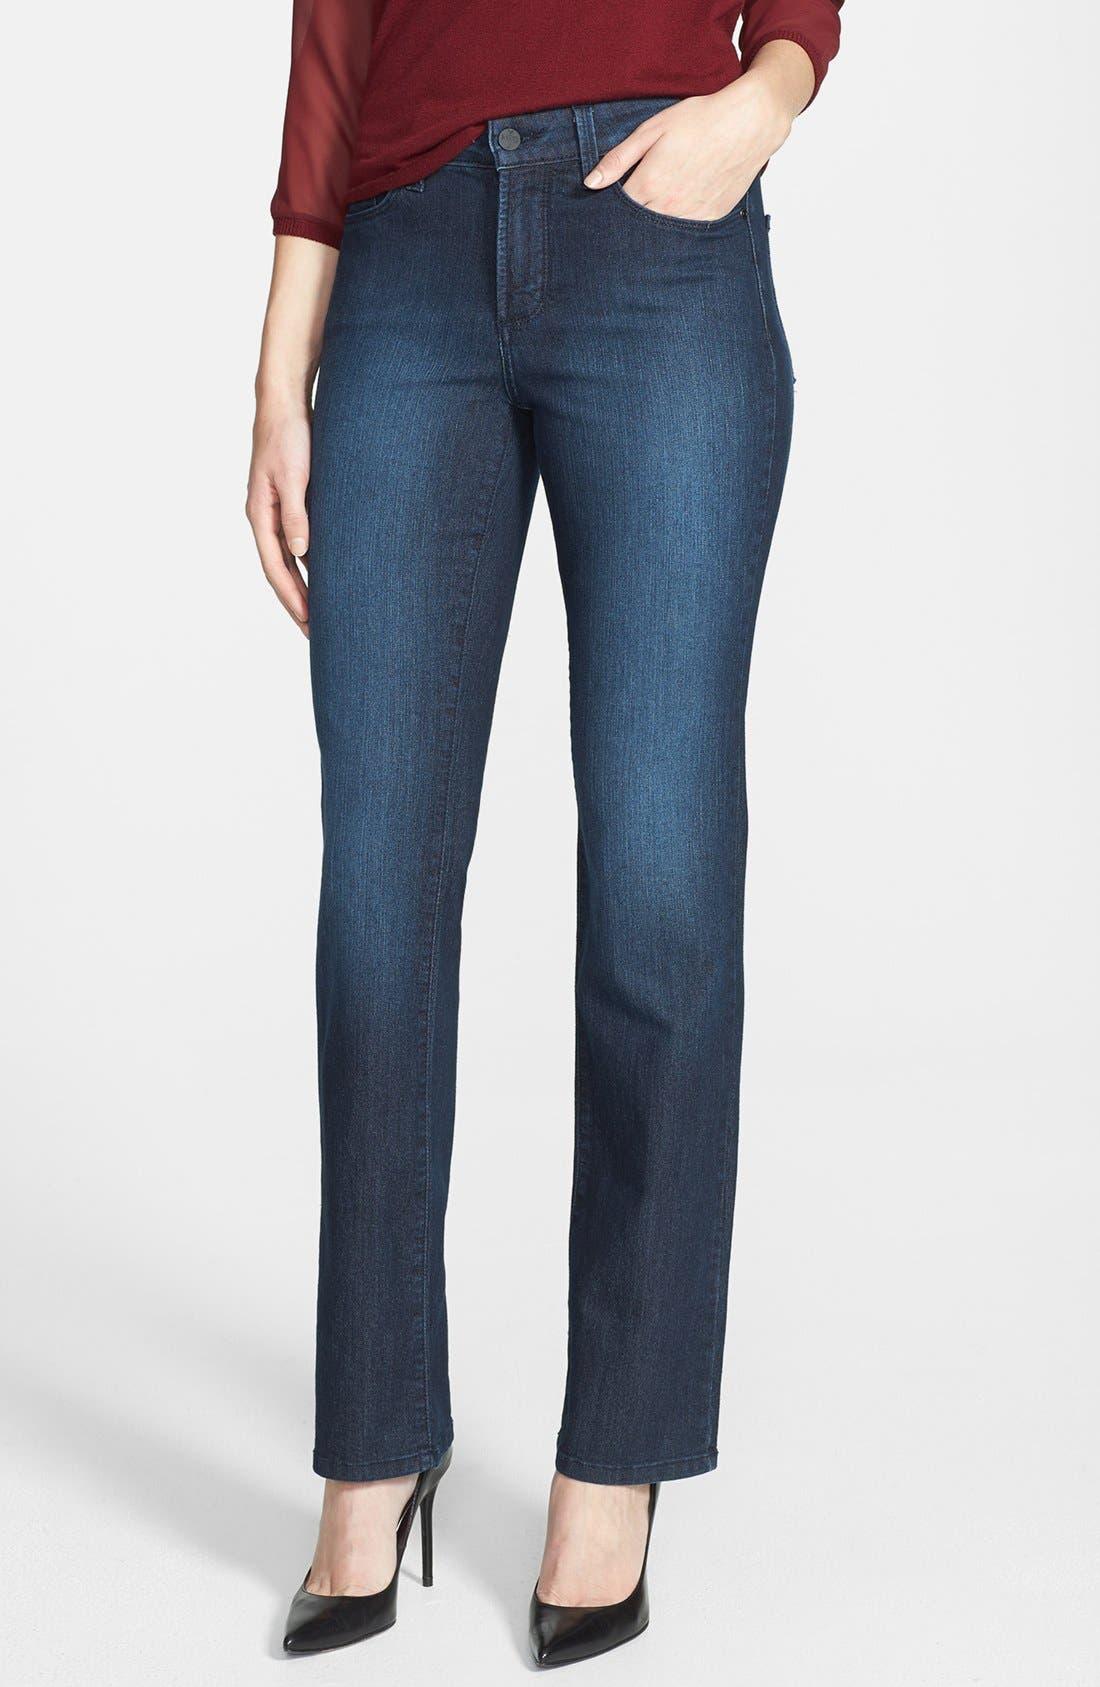 Alternate Image 1 Selected - NYDJ 'Marilyn' Stretch Straight Leg Jeans (Dana Point)